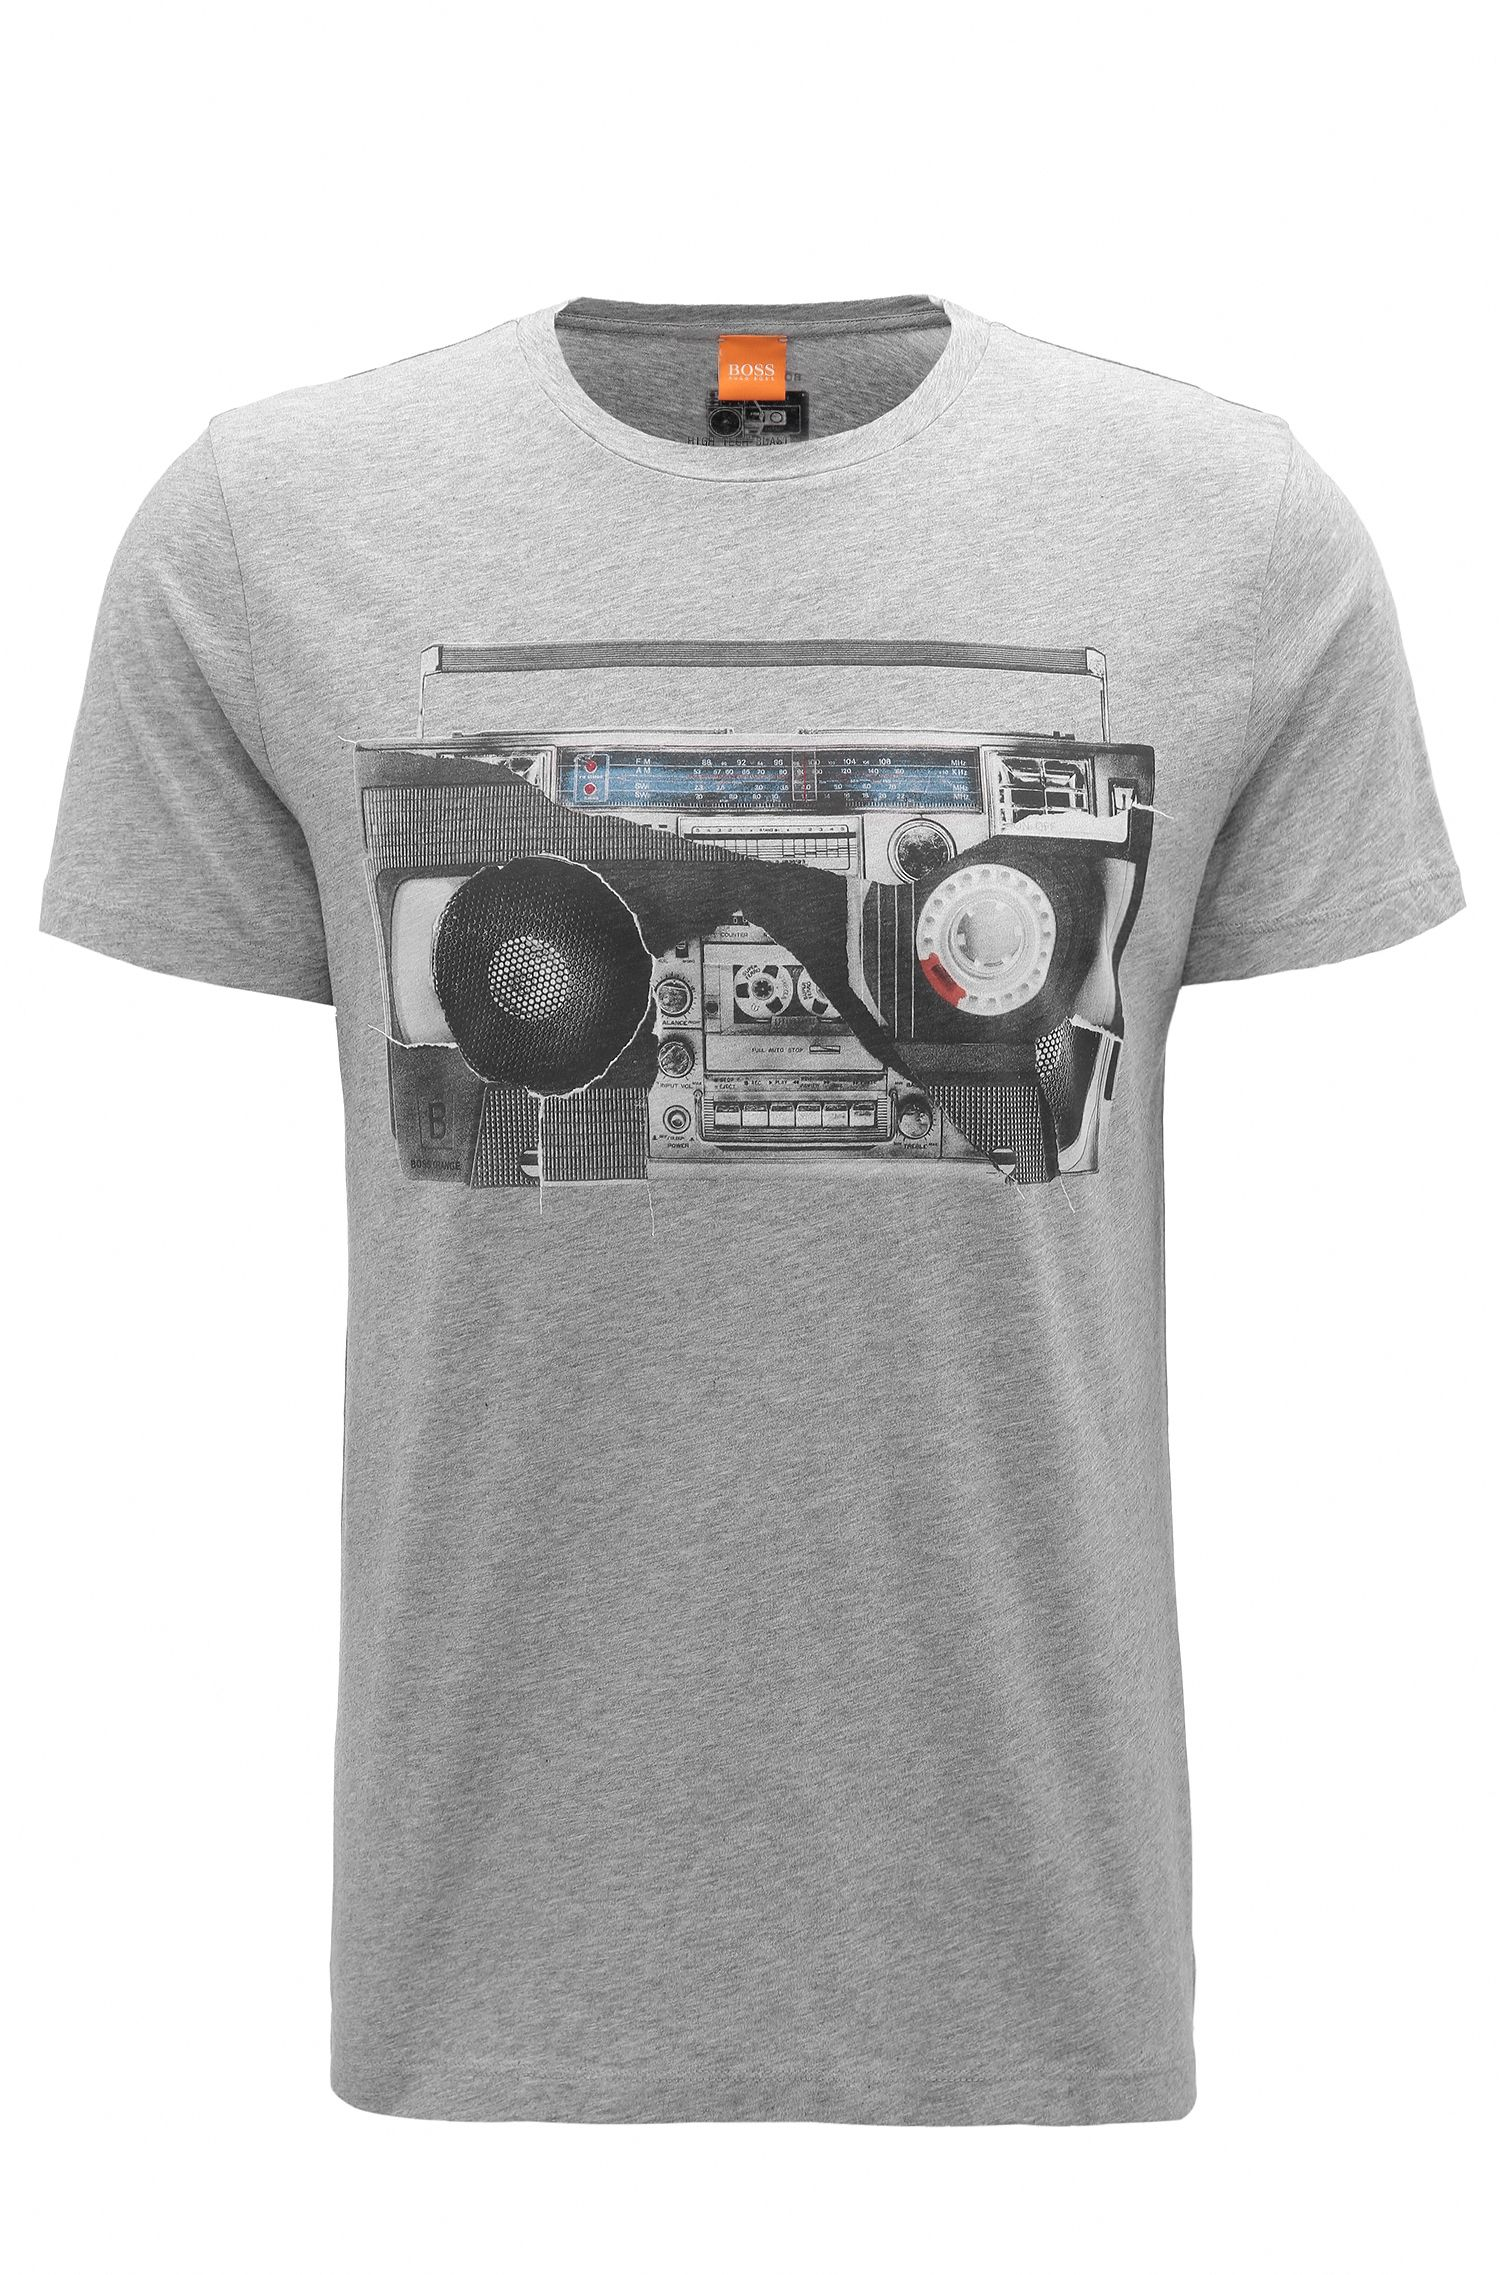 T-shirt regular fit in jersey di cotone con stampa digitale